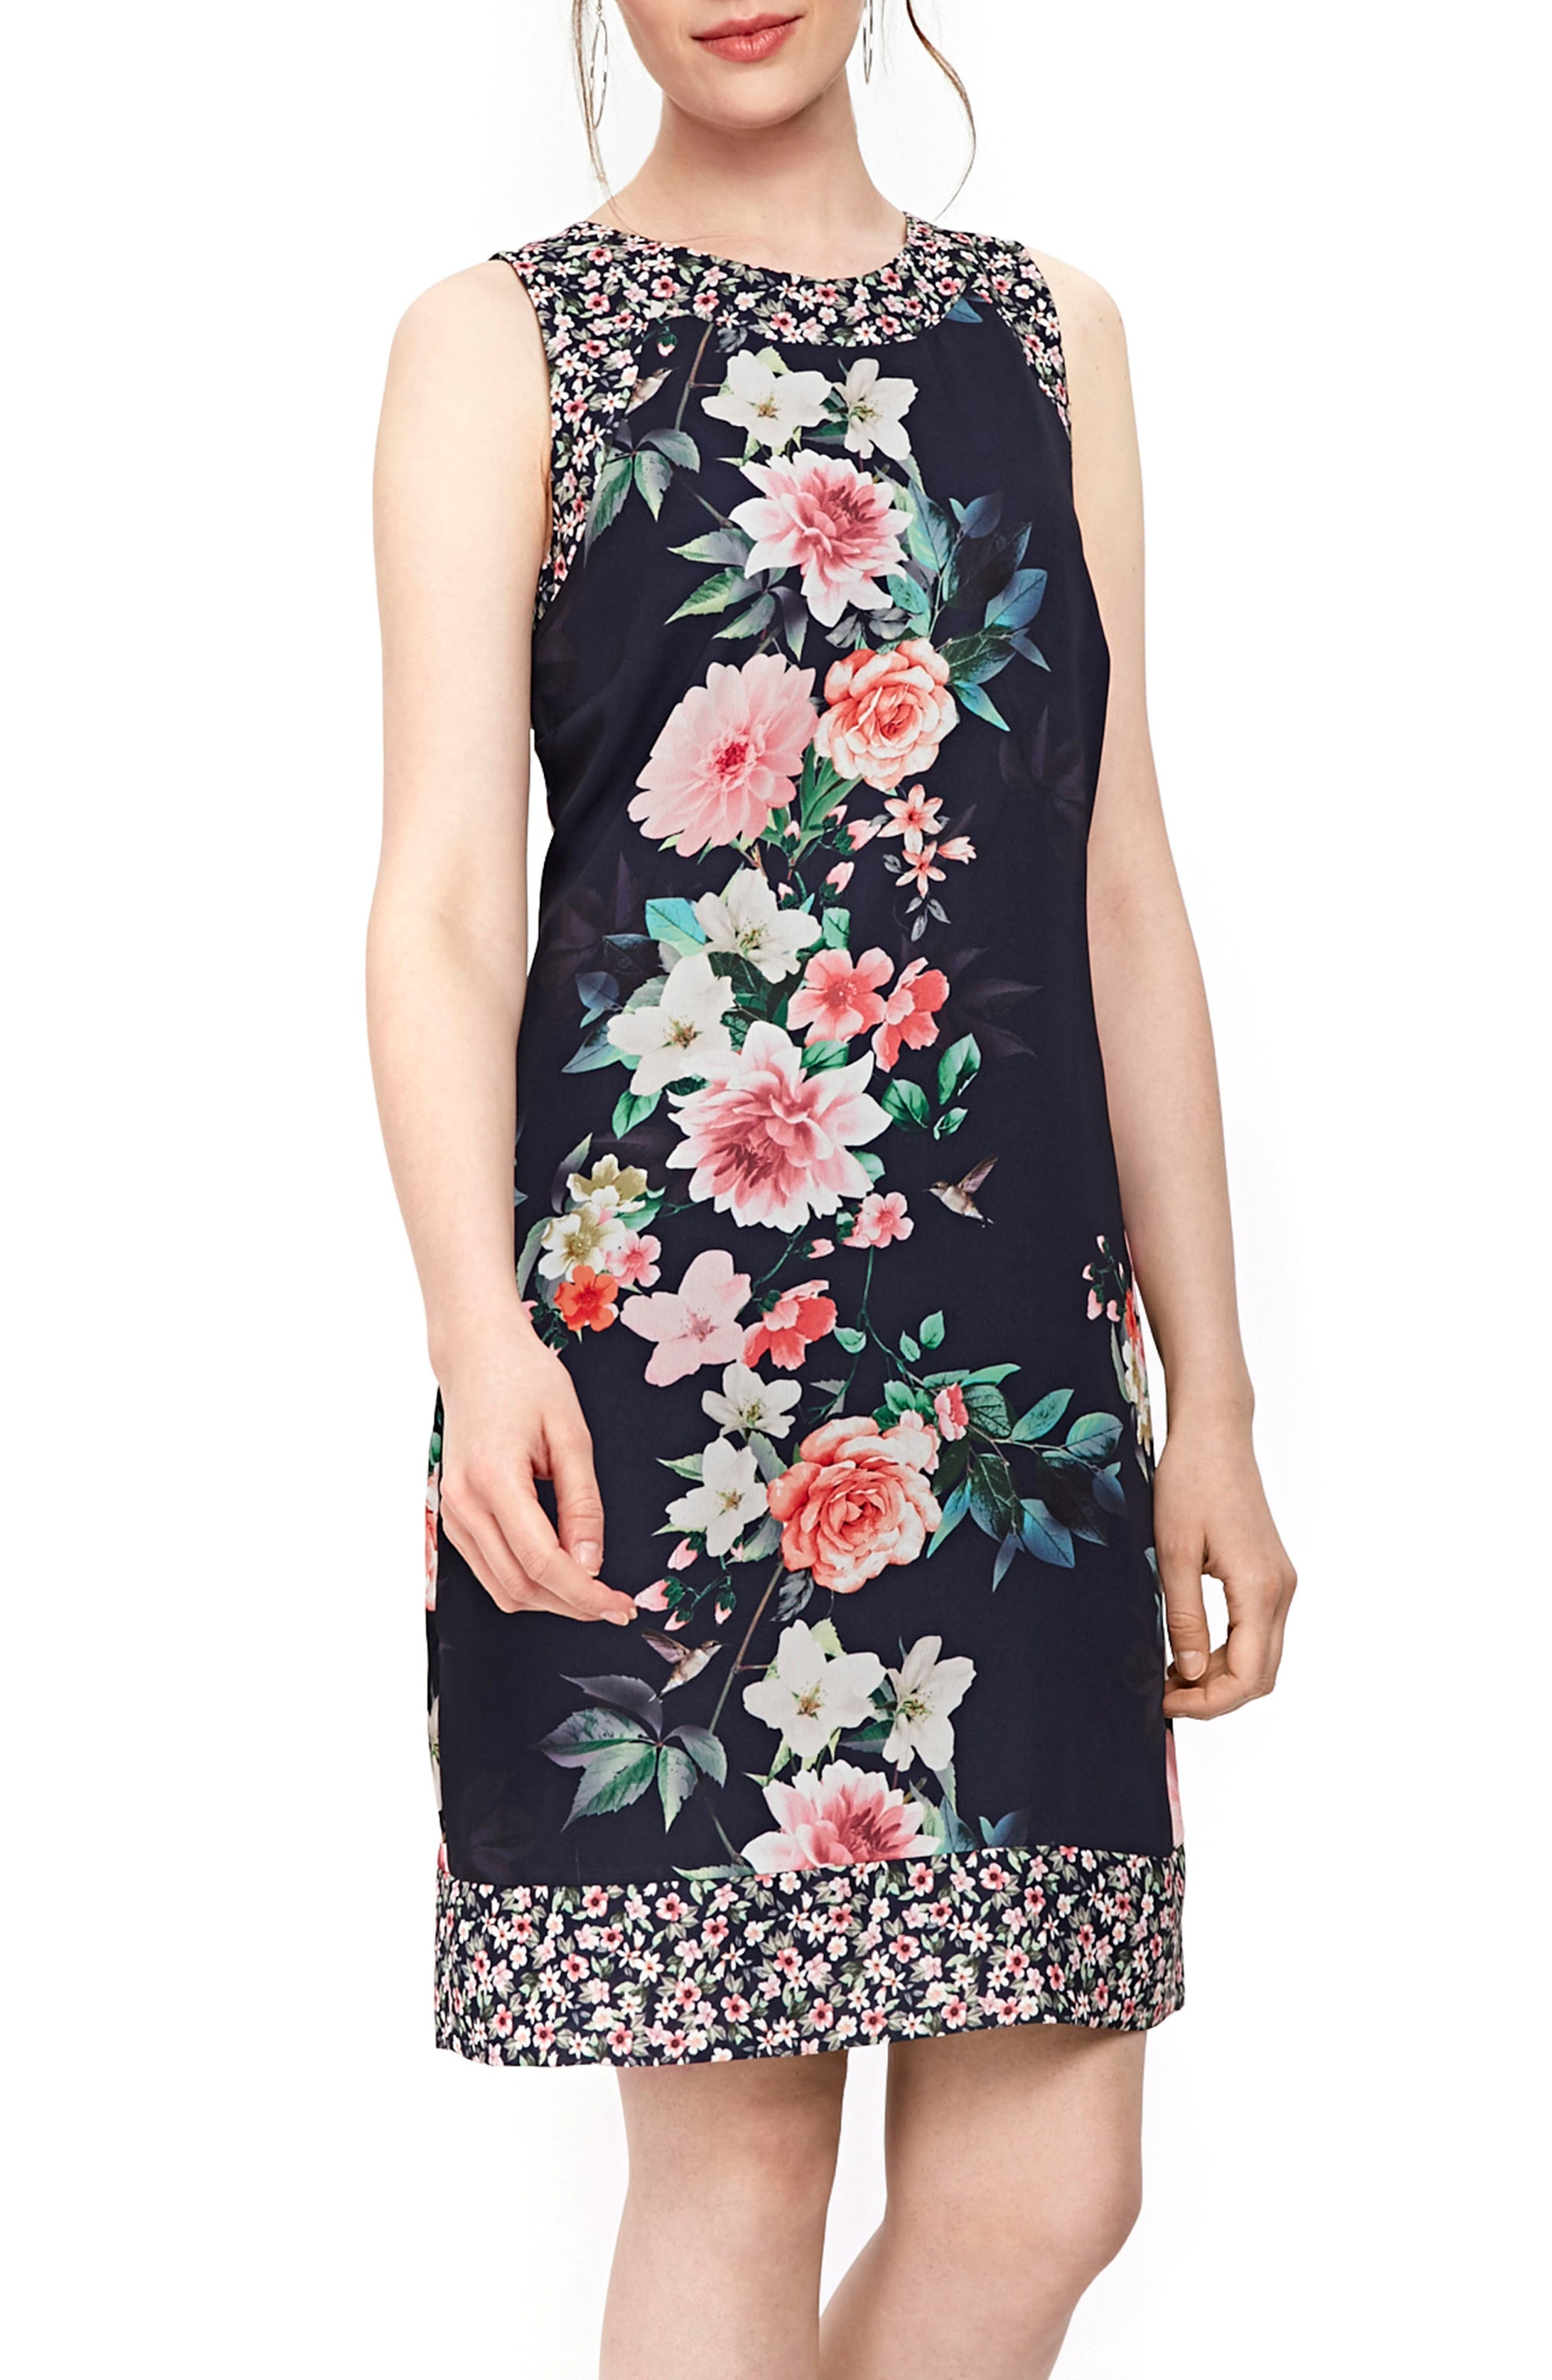 Peony Print Tank Dress,                             Alternate thumbnail 3, color,                             NAVY BLUE